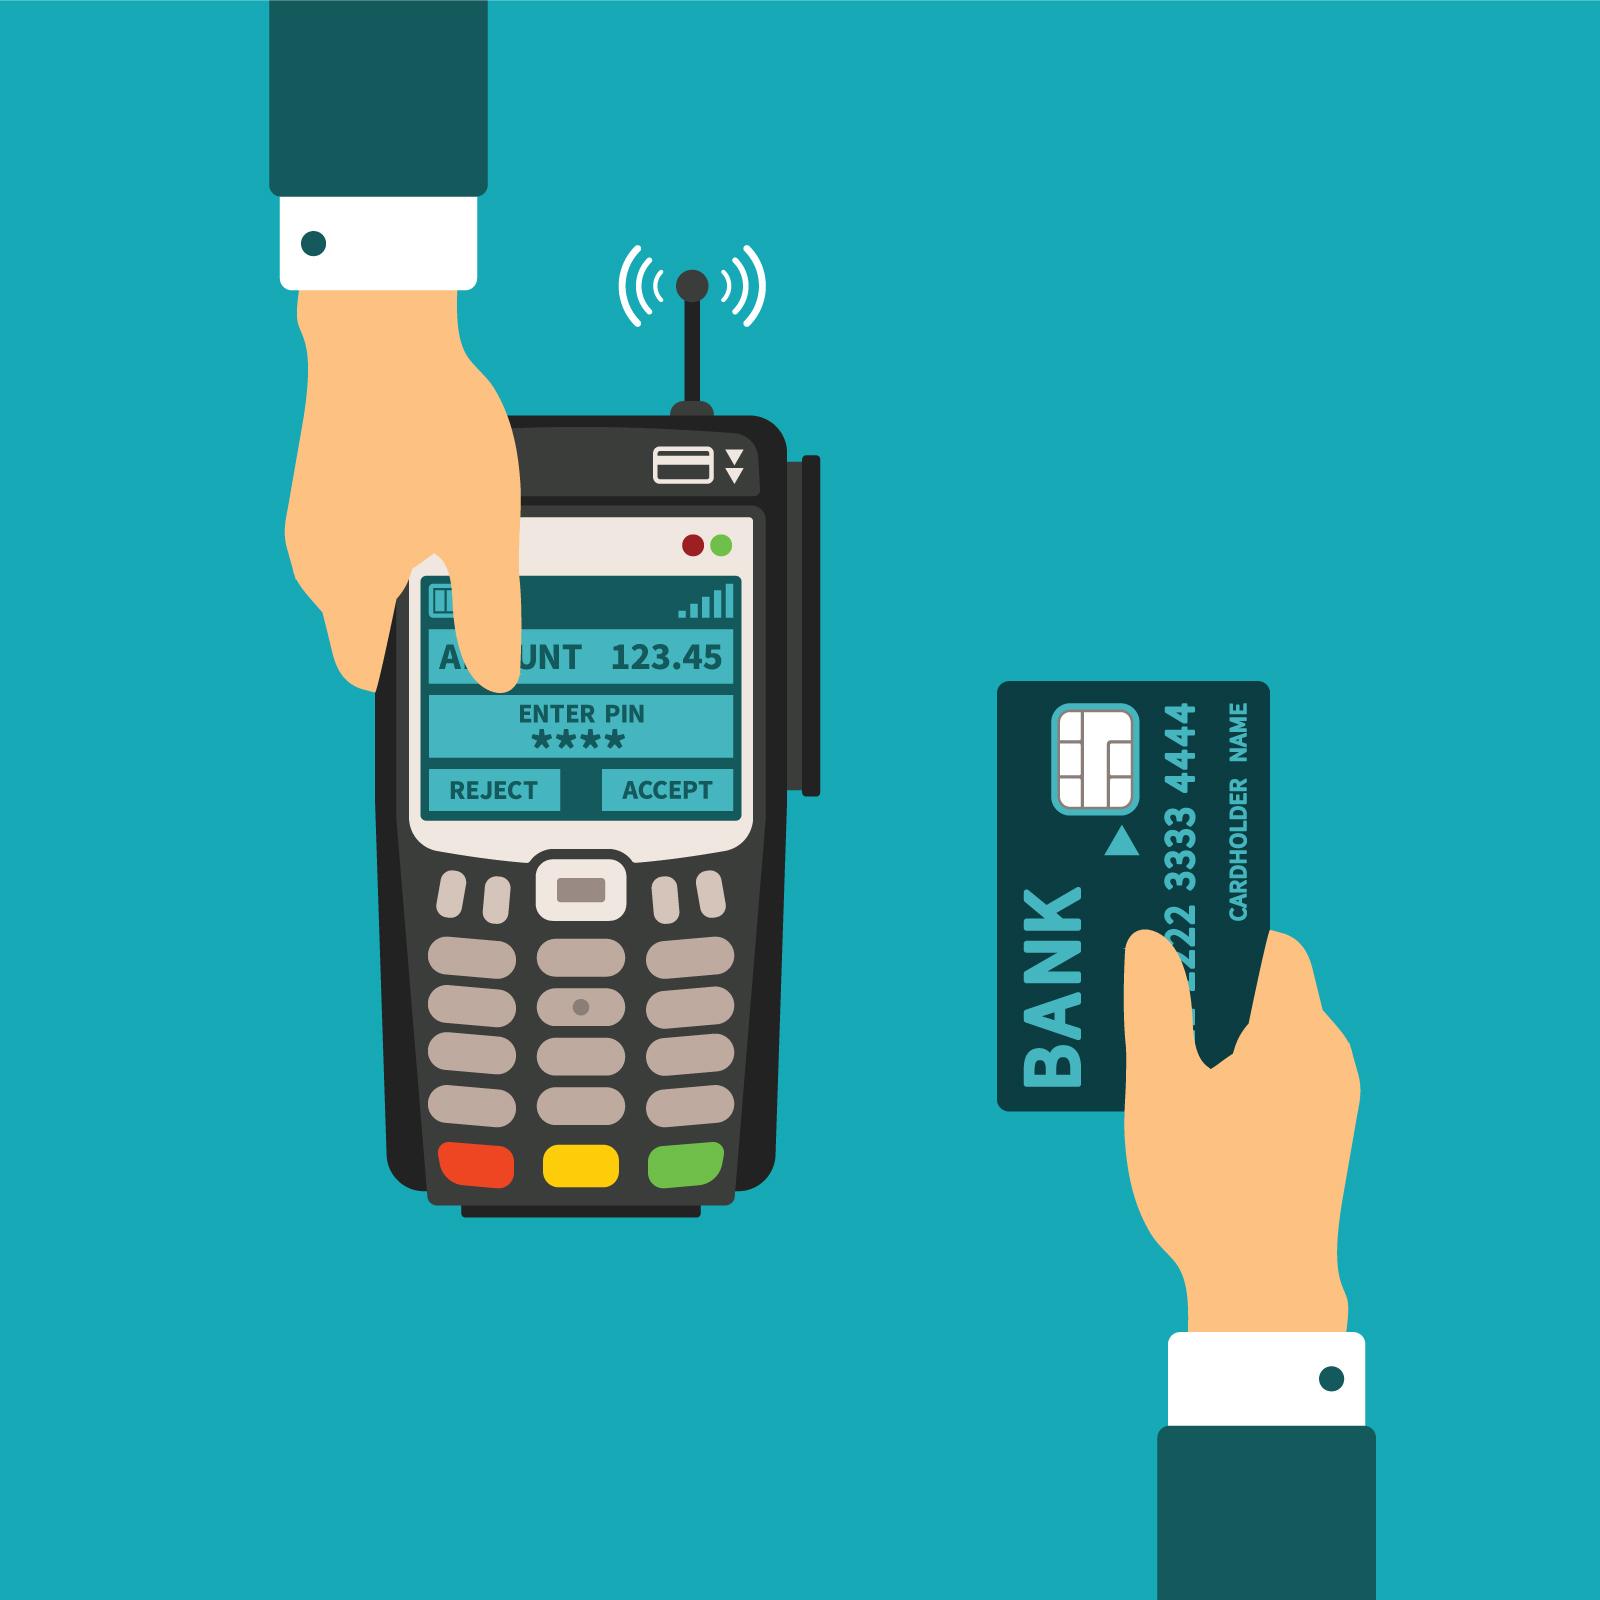 Credit Card Processing Network Diagram